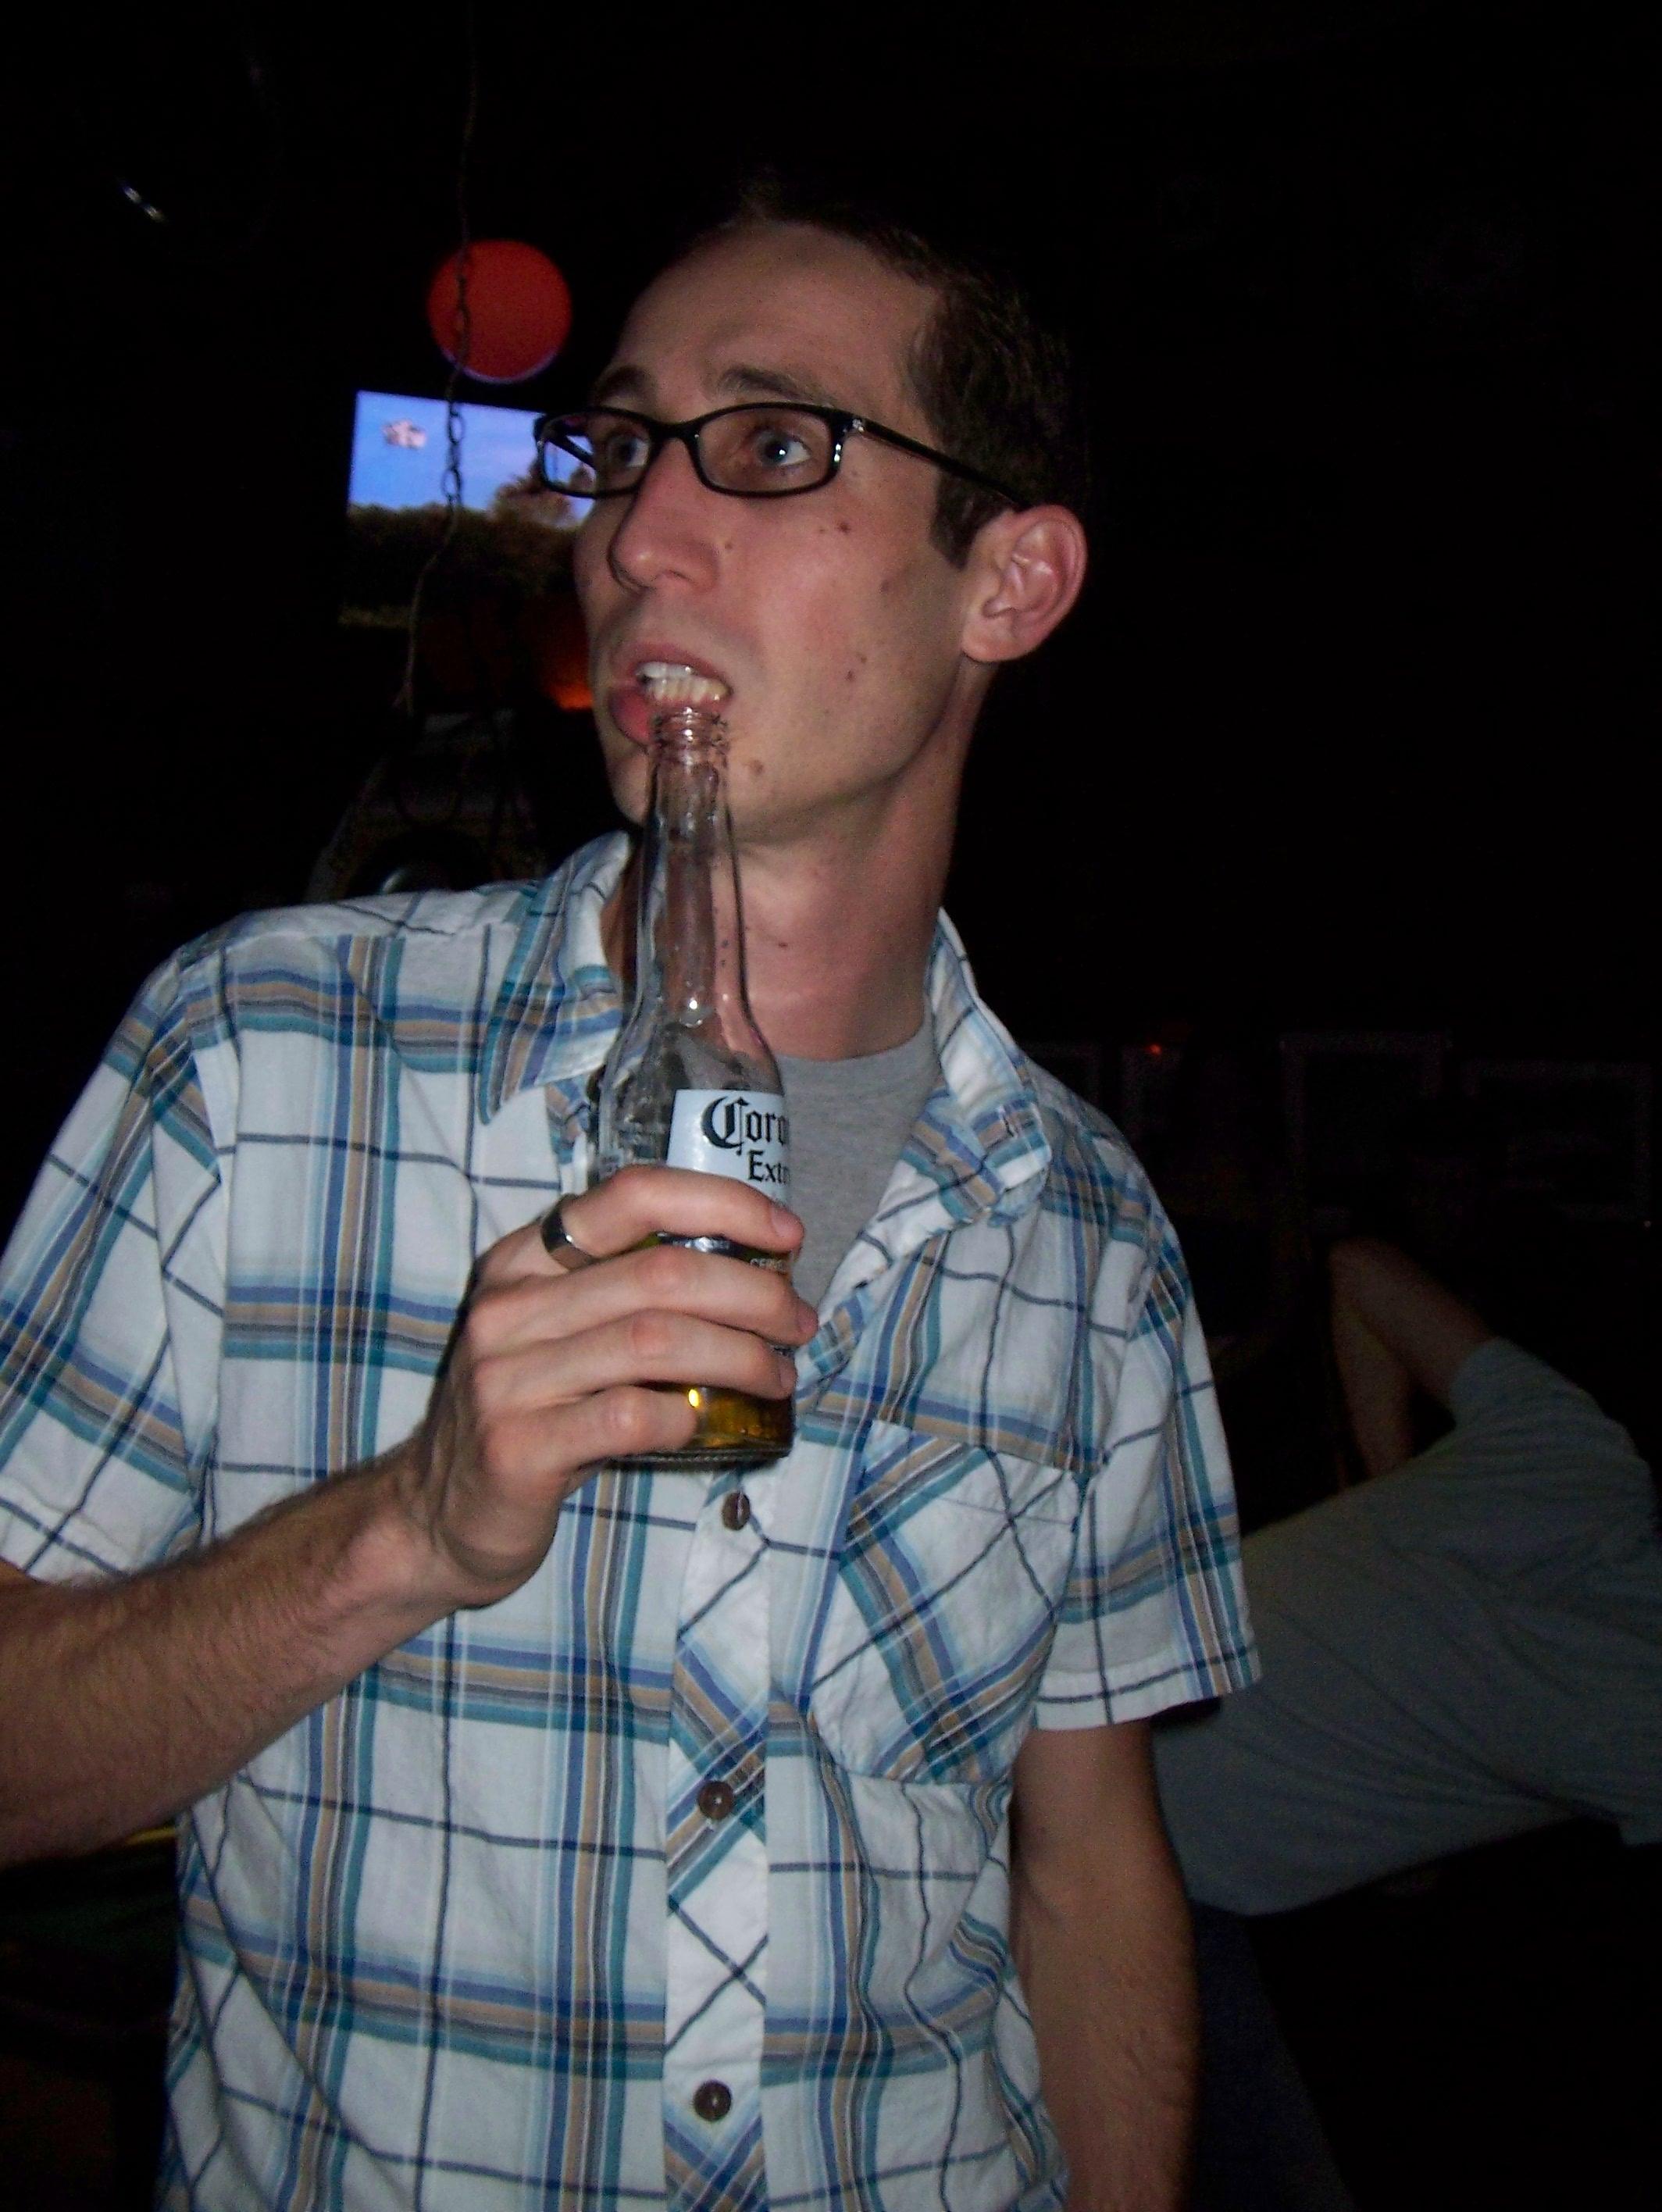 Ryan's Glasses Make Me Emo